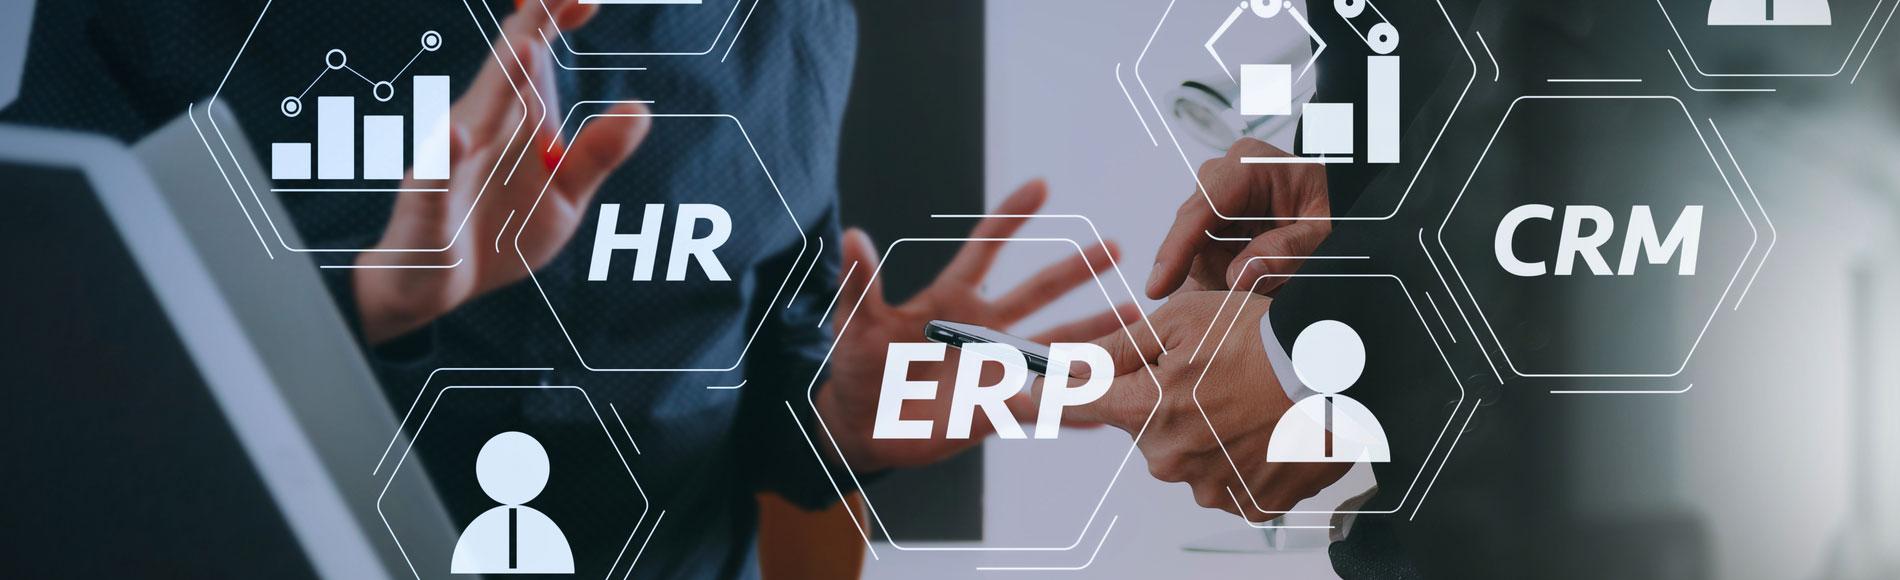 ERP-EDI-Process-Banner